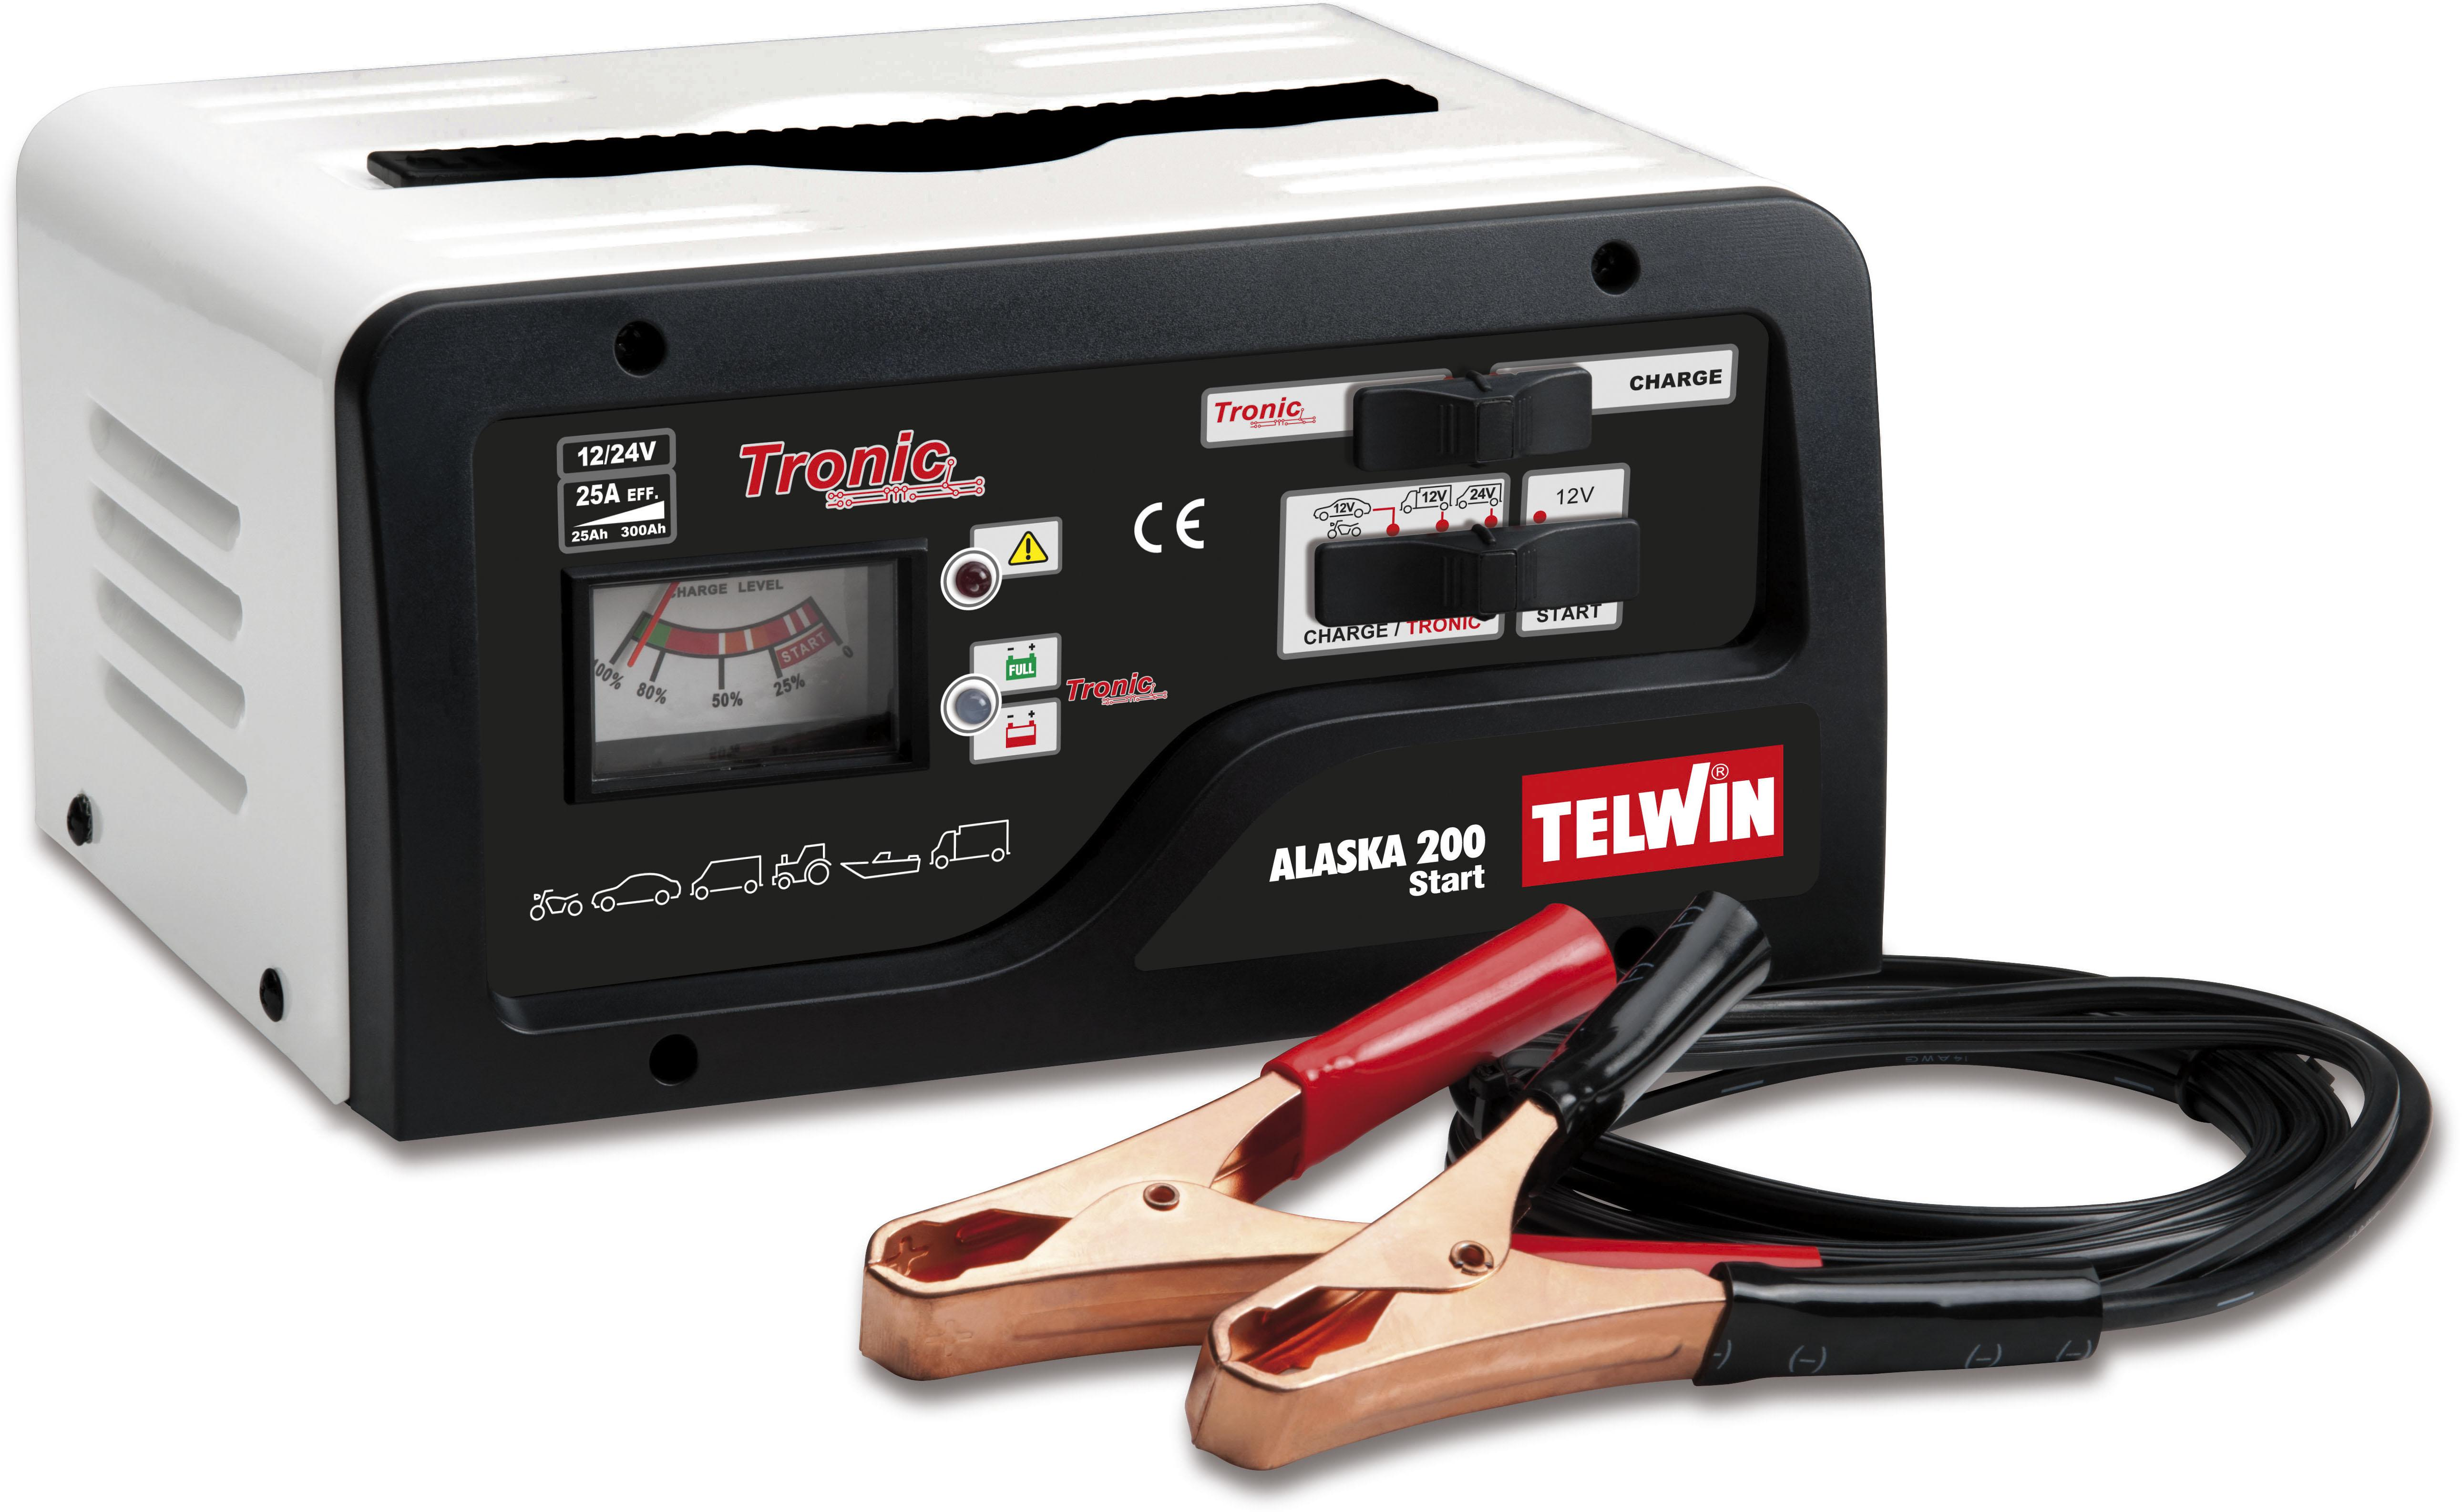 купить Устройство пуско-зарядное Telwin Alaska 200 start по цене 7579 рублей